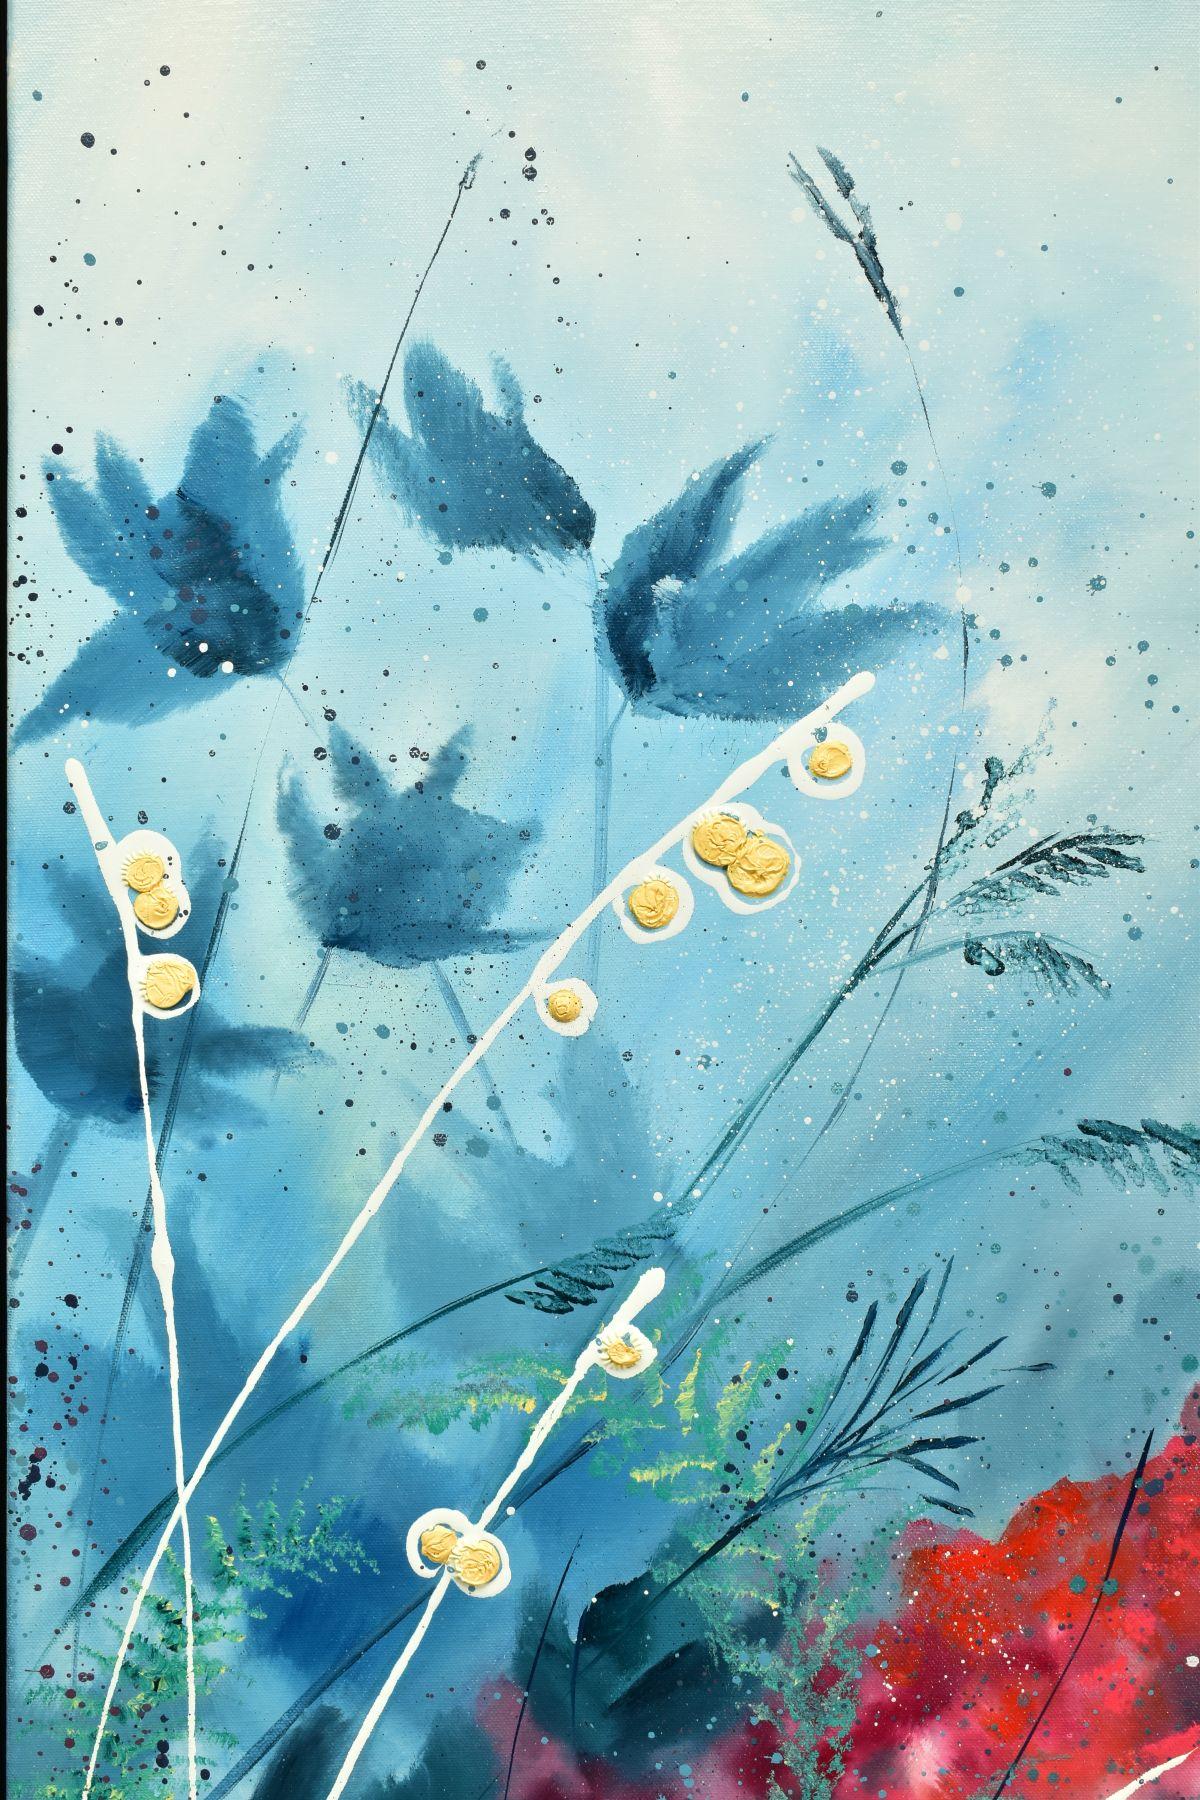 JULIE ANN SCOTT (BRITISH CONTEMPORARY), 'Home Spun Joy', wild flowers against a blue backdrop, - Image 2 of 7